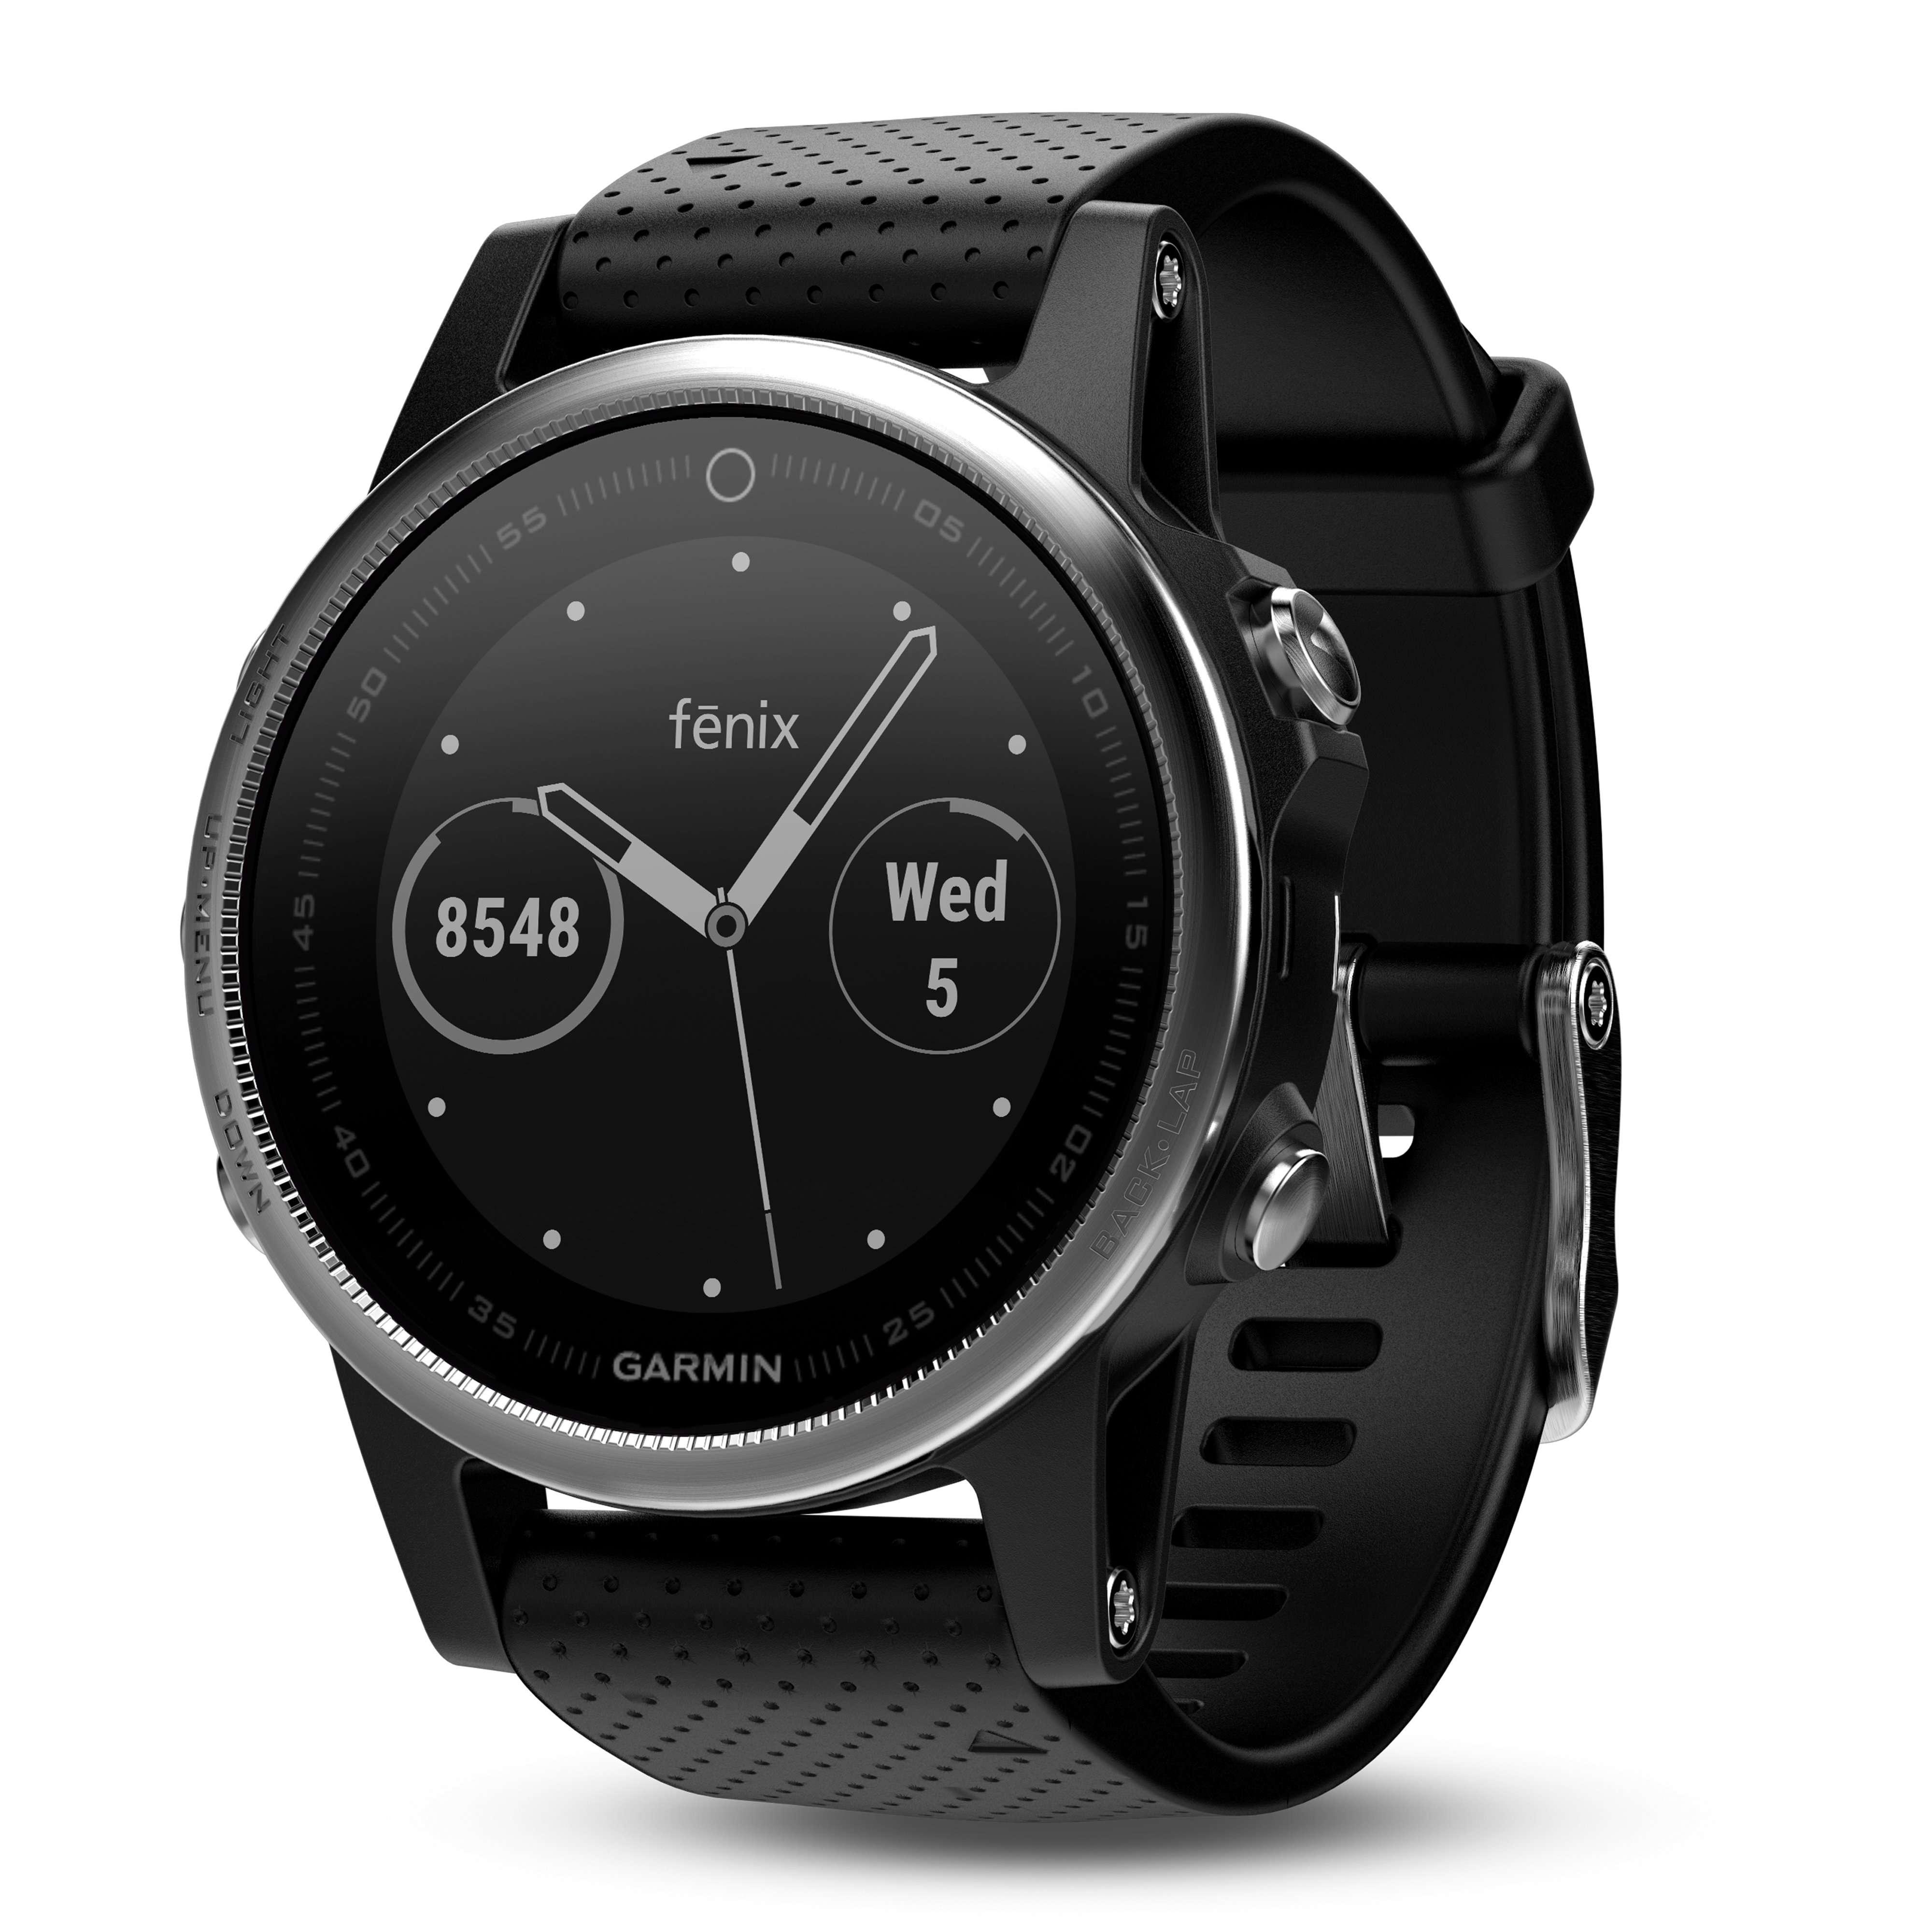 GARMIN fēnix® 5S Multisport GPS Watch